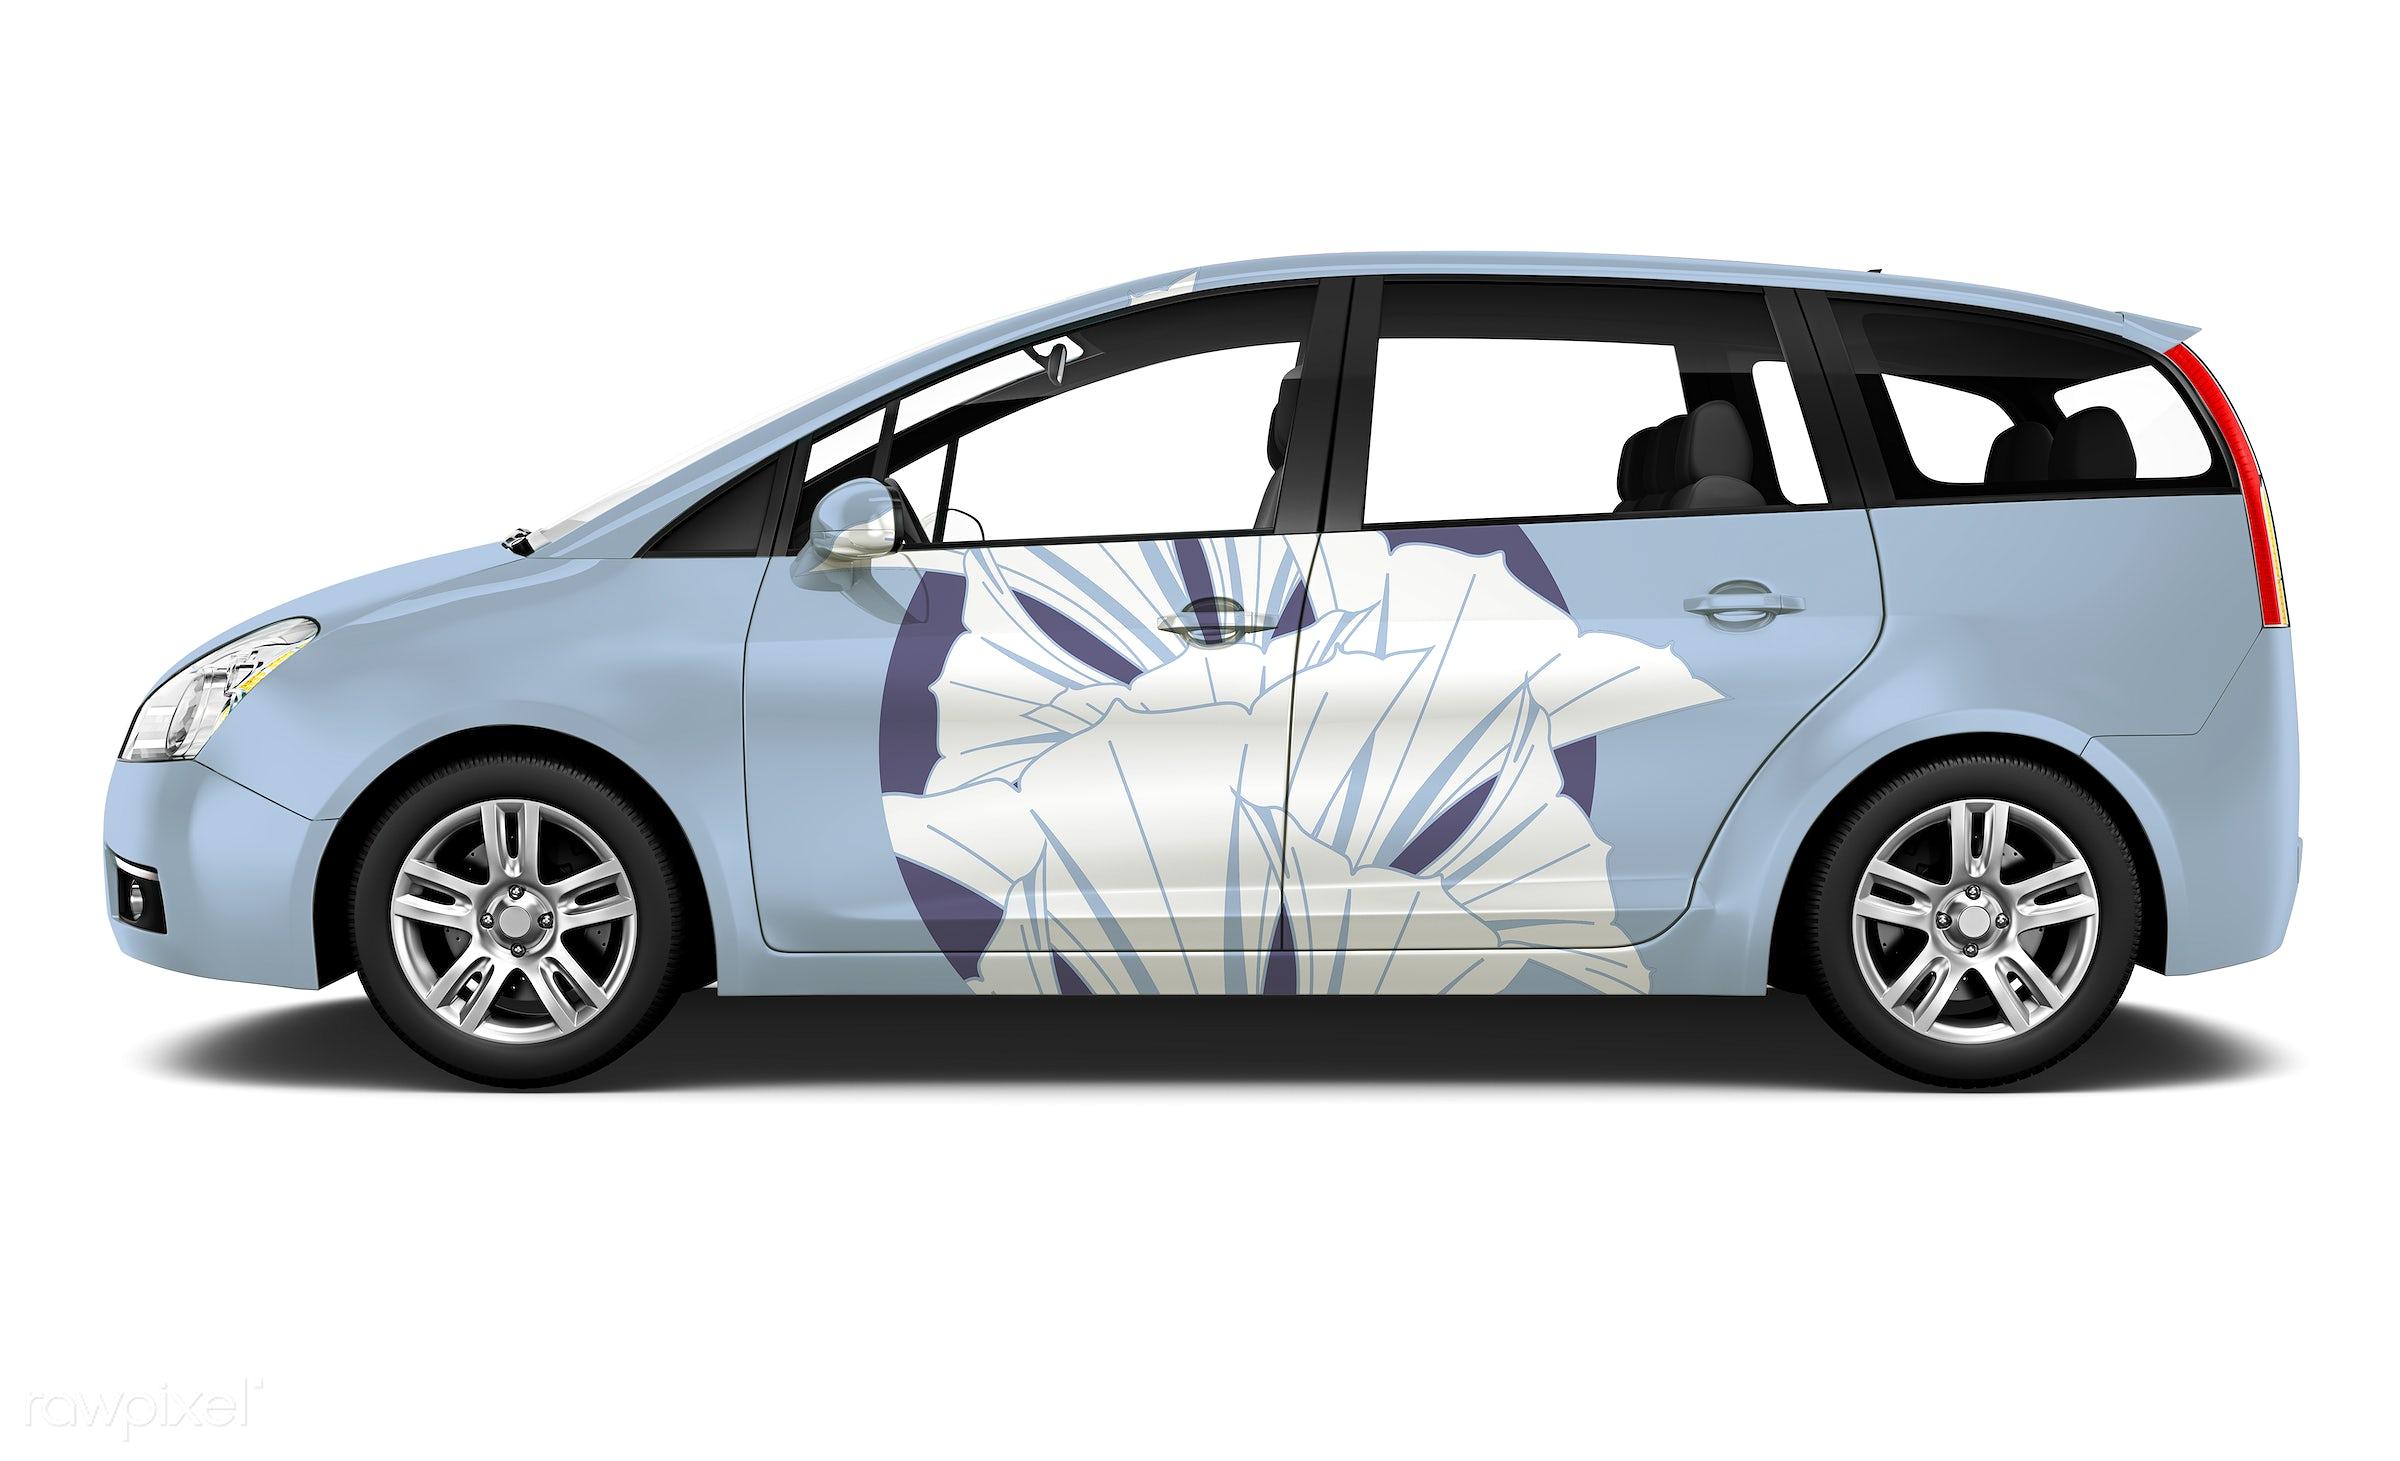 Three dimensional image of car - 3d, automobile, automotive, background, blue, brandless, car, concept car, creativity,...